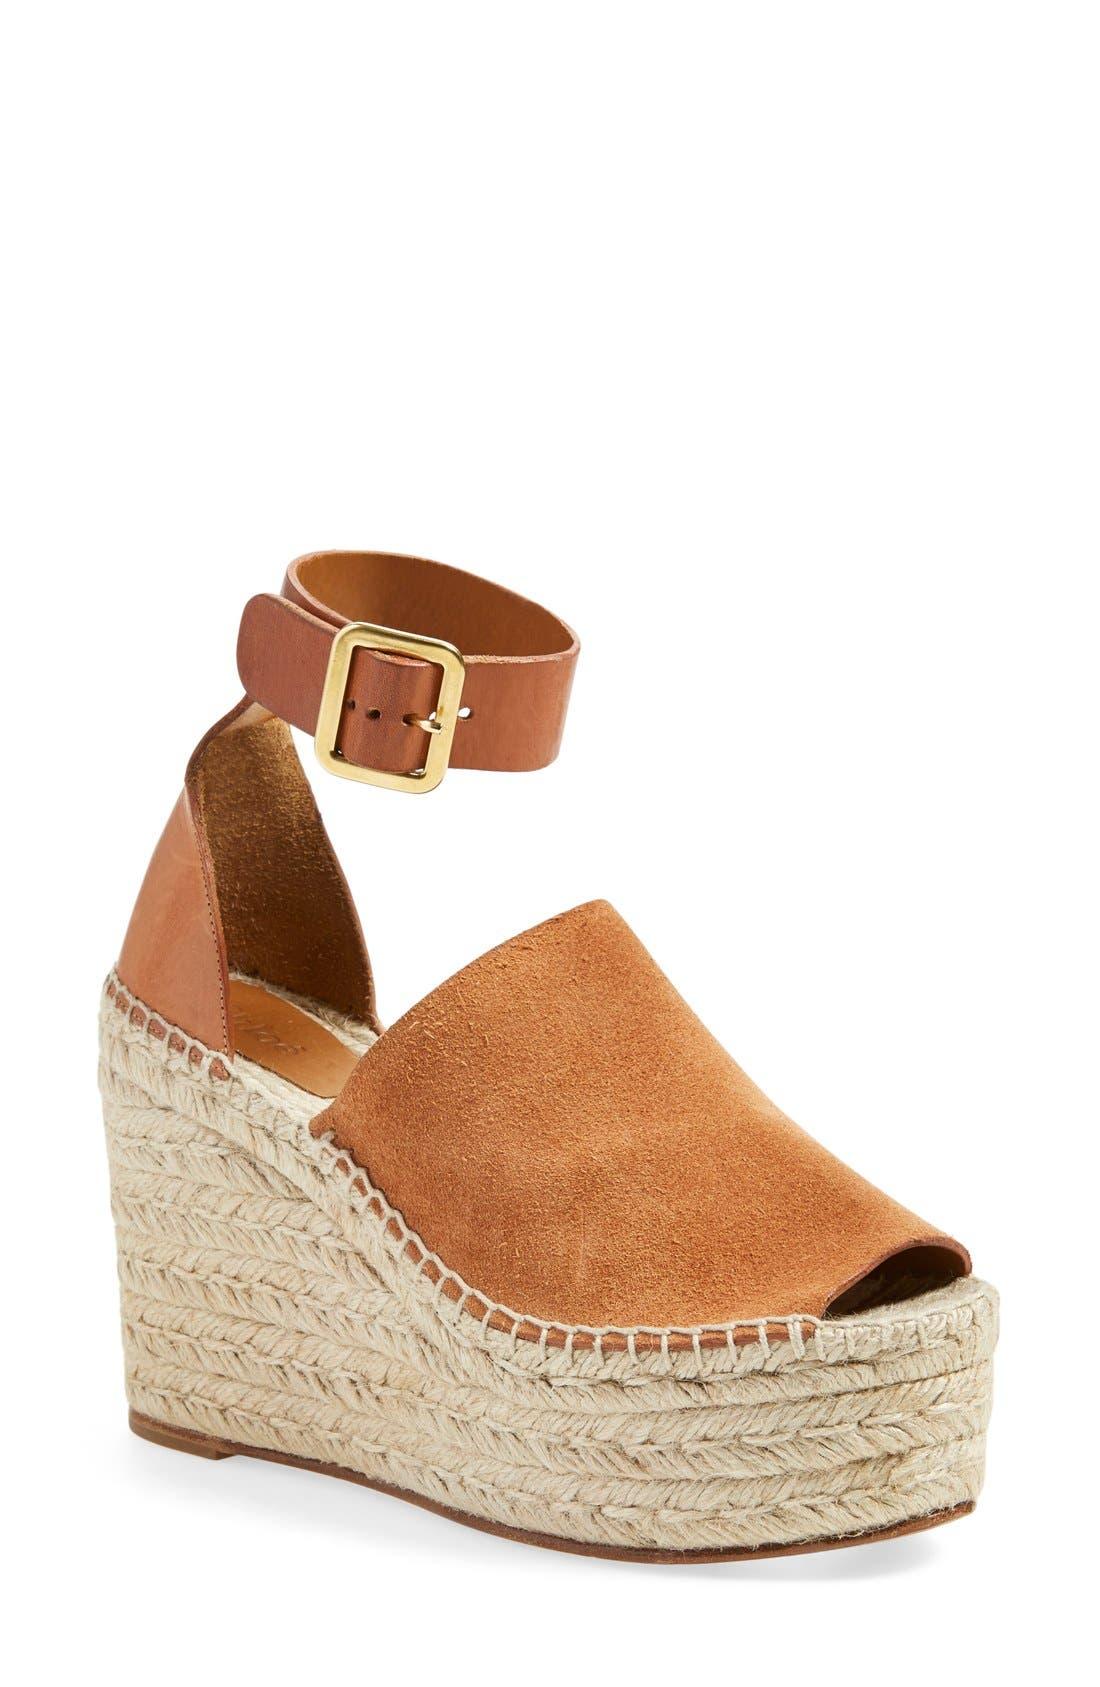 CHLOÉ 'Isa' Espadrille Wedge Sandal, Main, color, 200